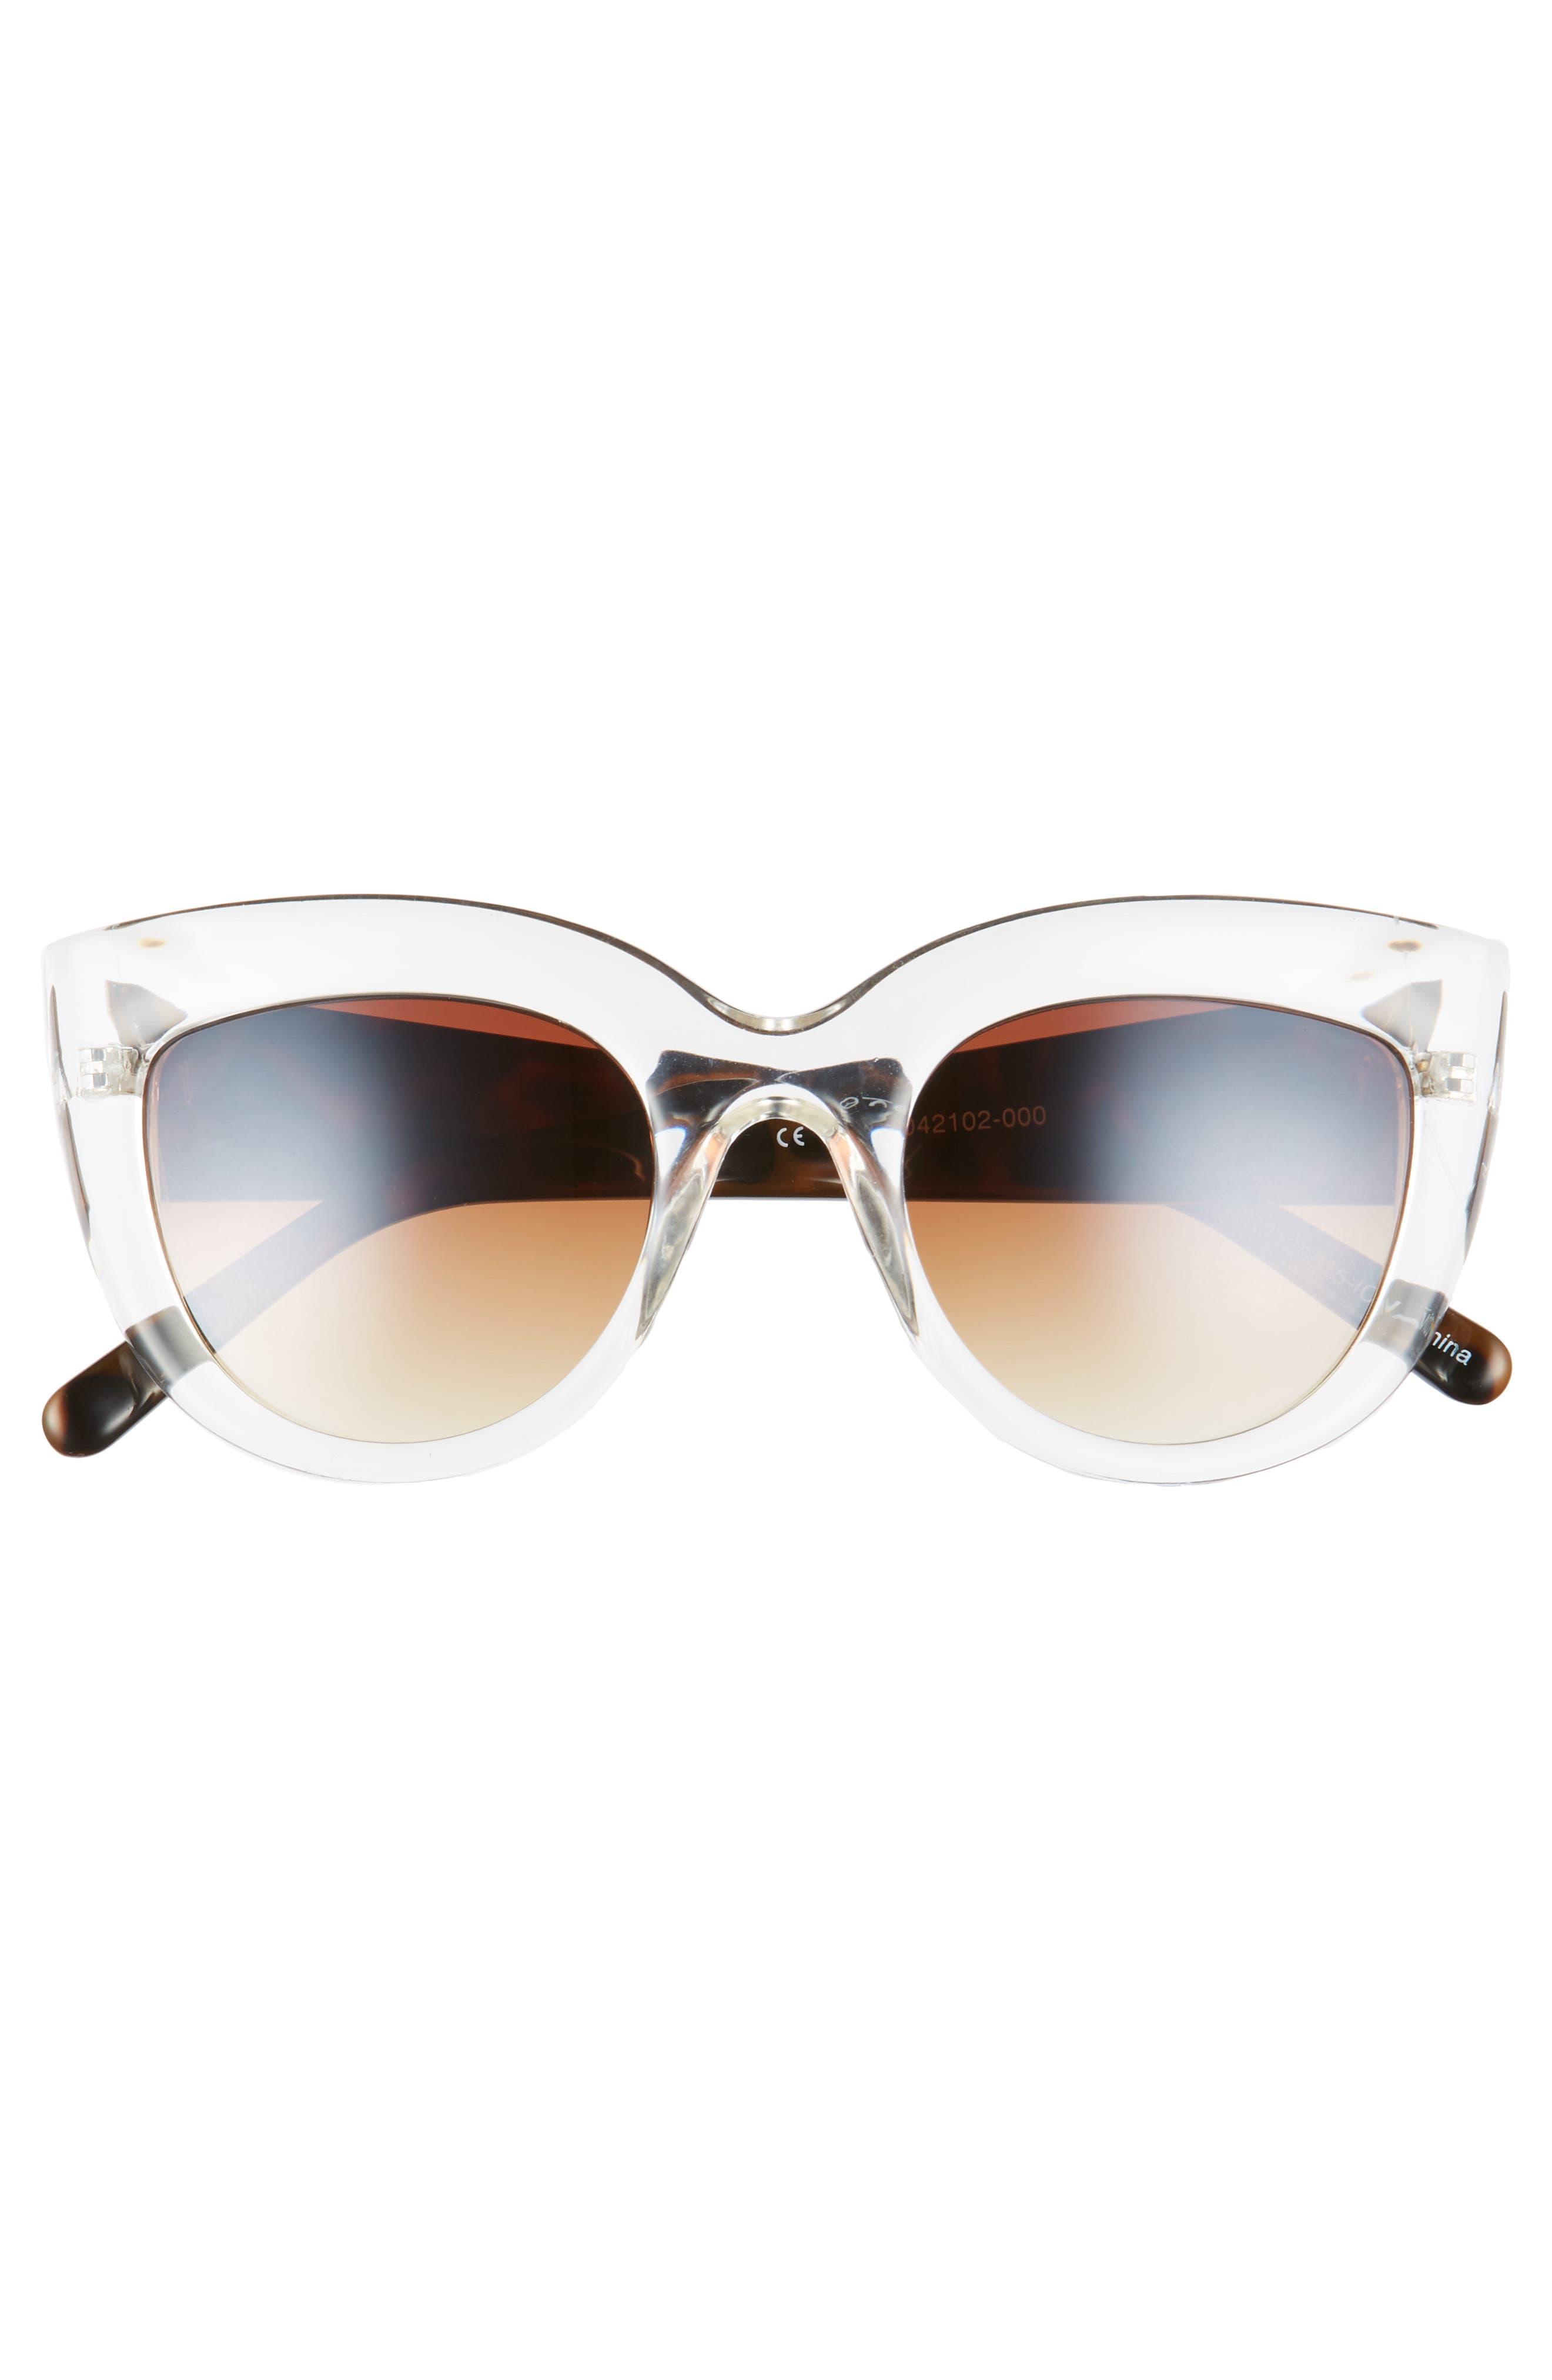 Translucent Cat Eye Sunglasses,                             Alternate thumbnail 3, color,                             Tort/ Clear